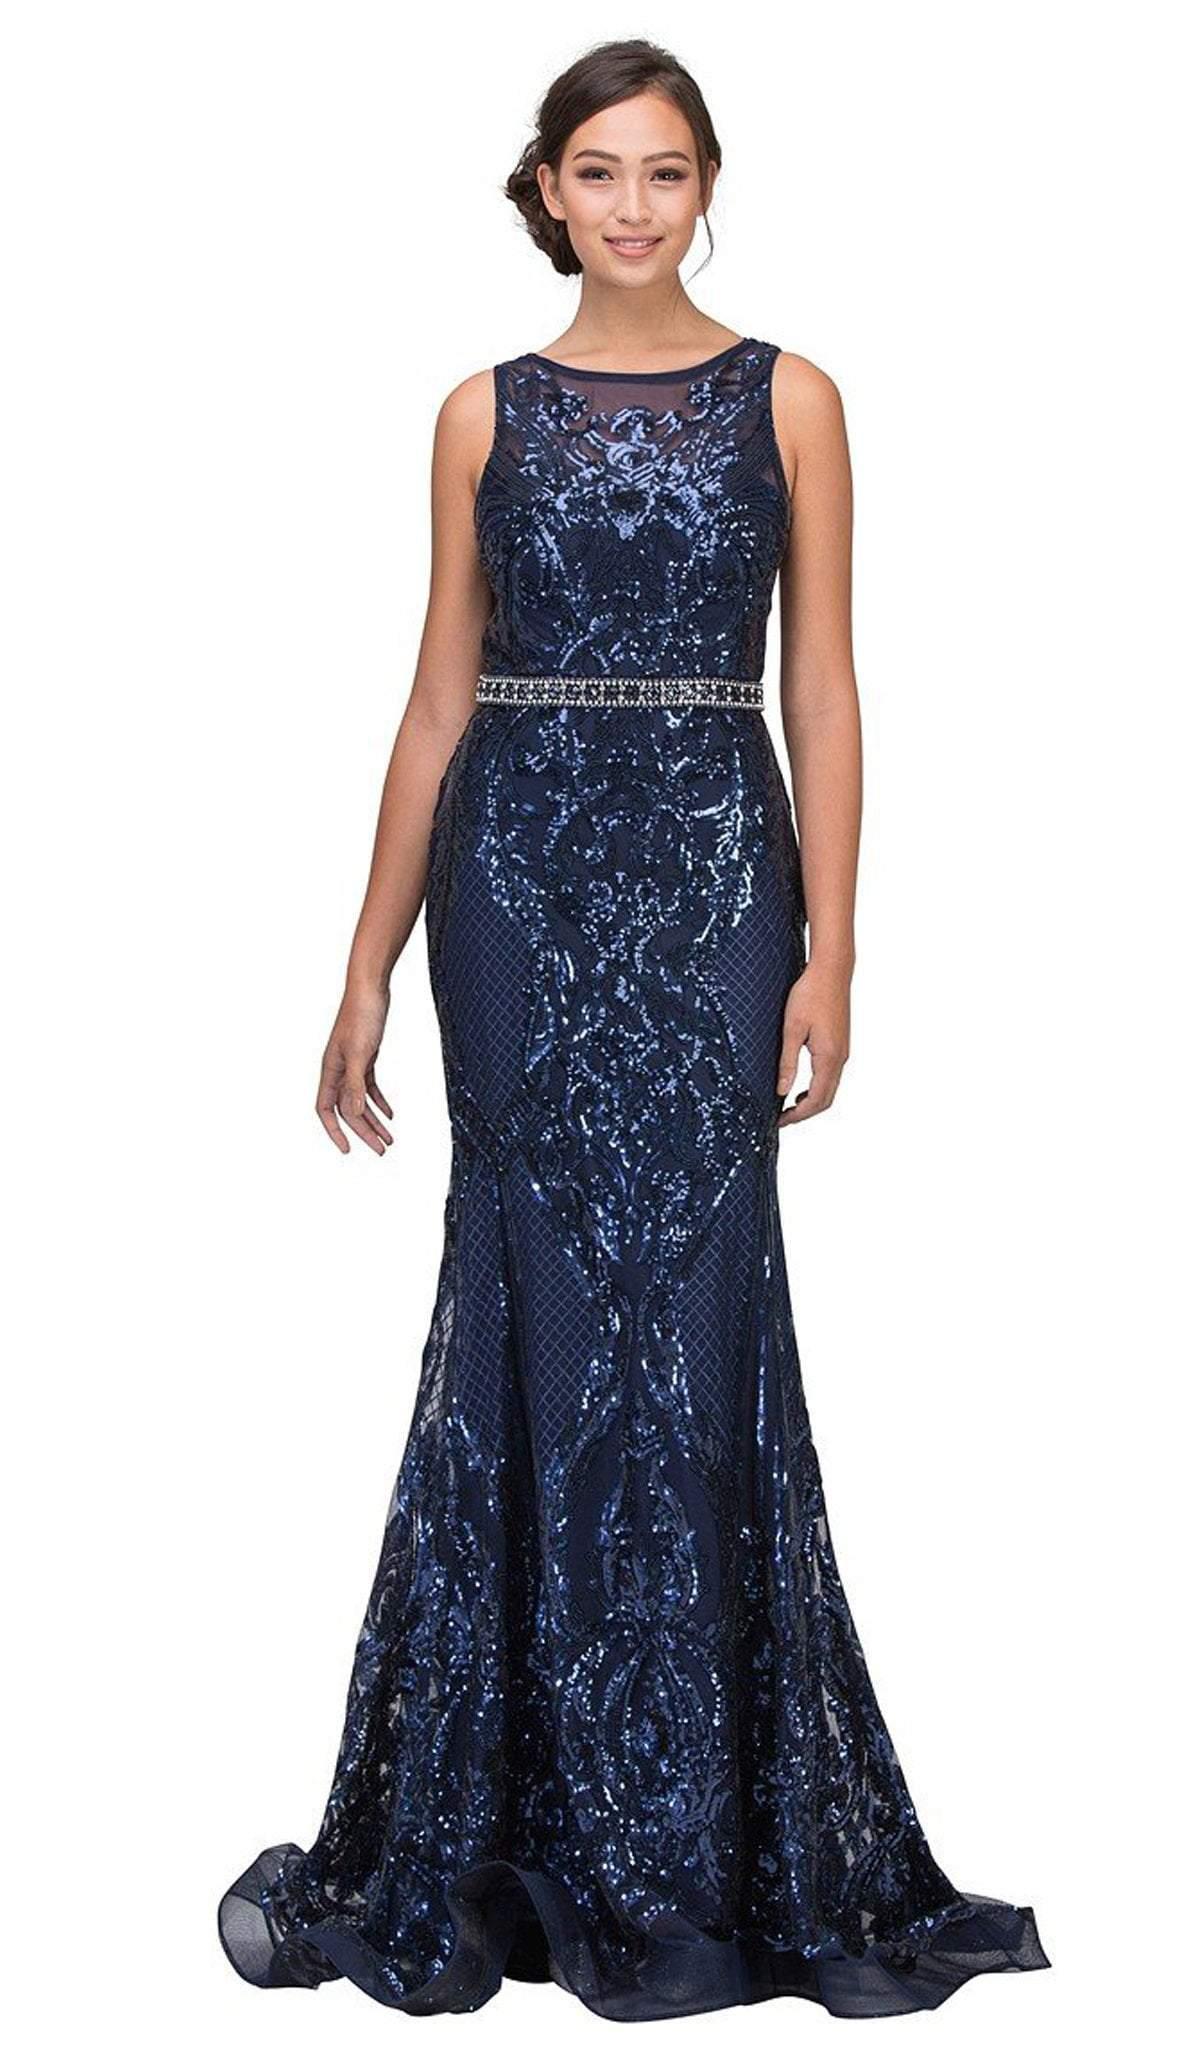 Eureka Fashion - 7335 Sequined Mesh Bateau Mermaid Dress